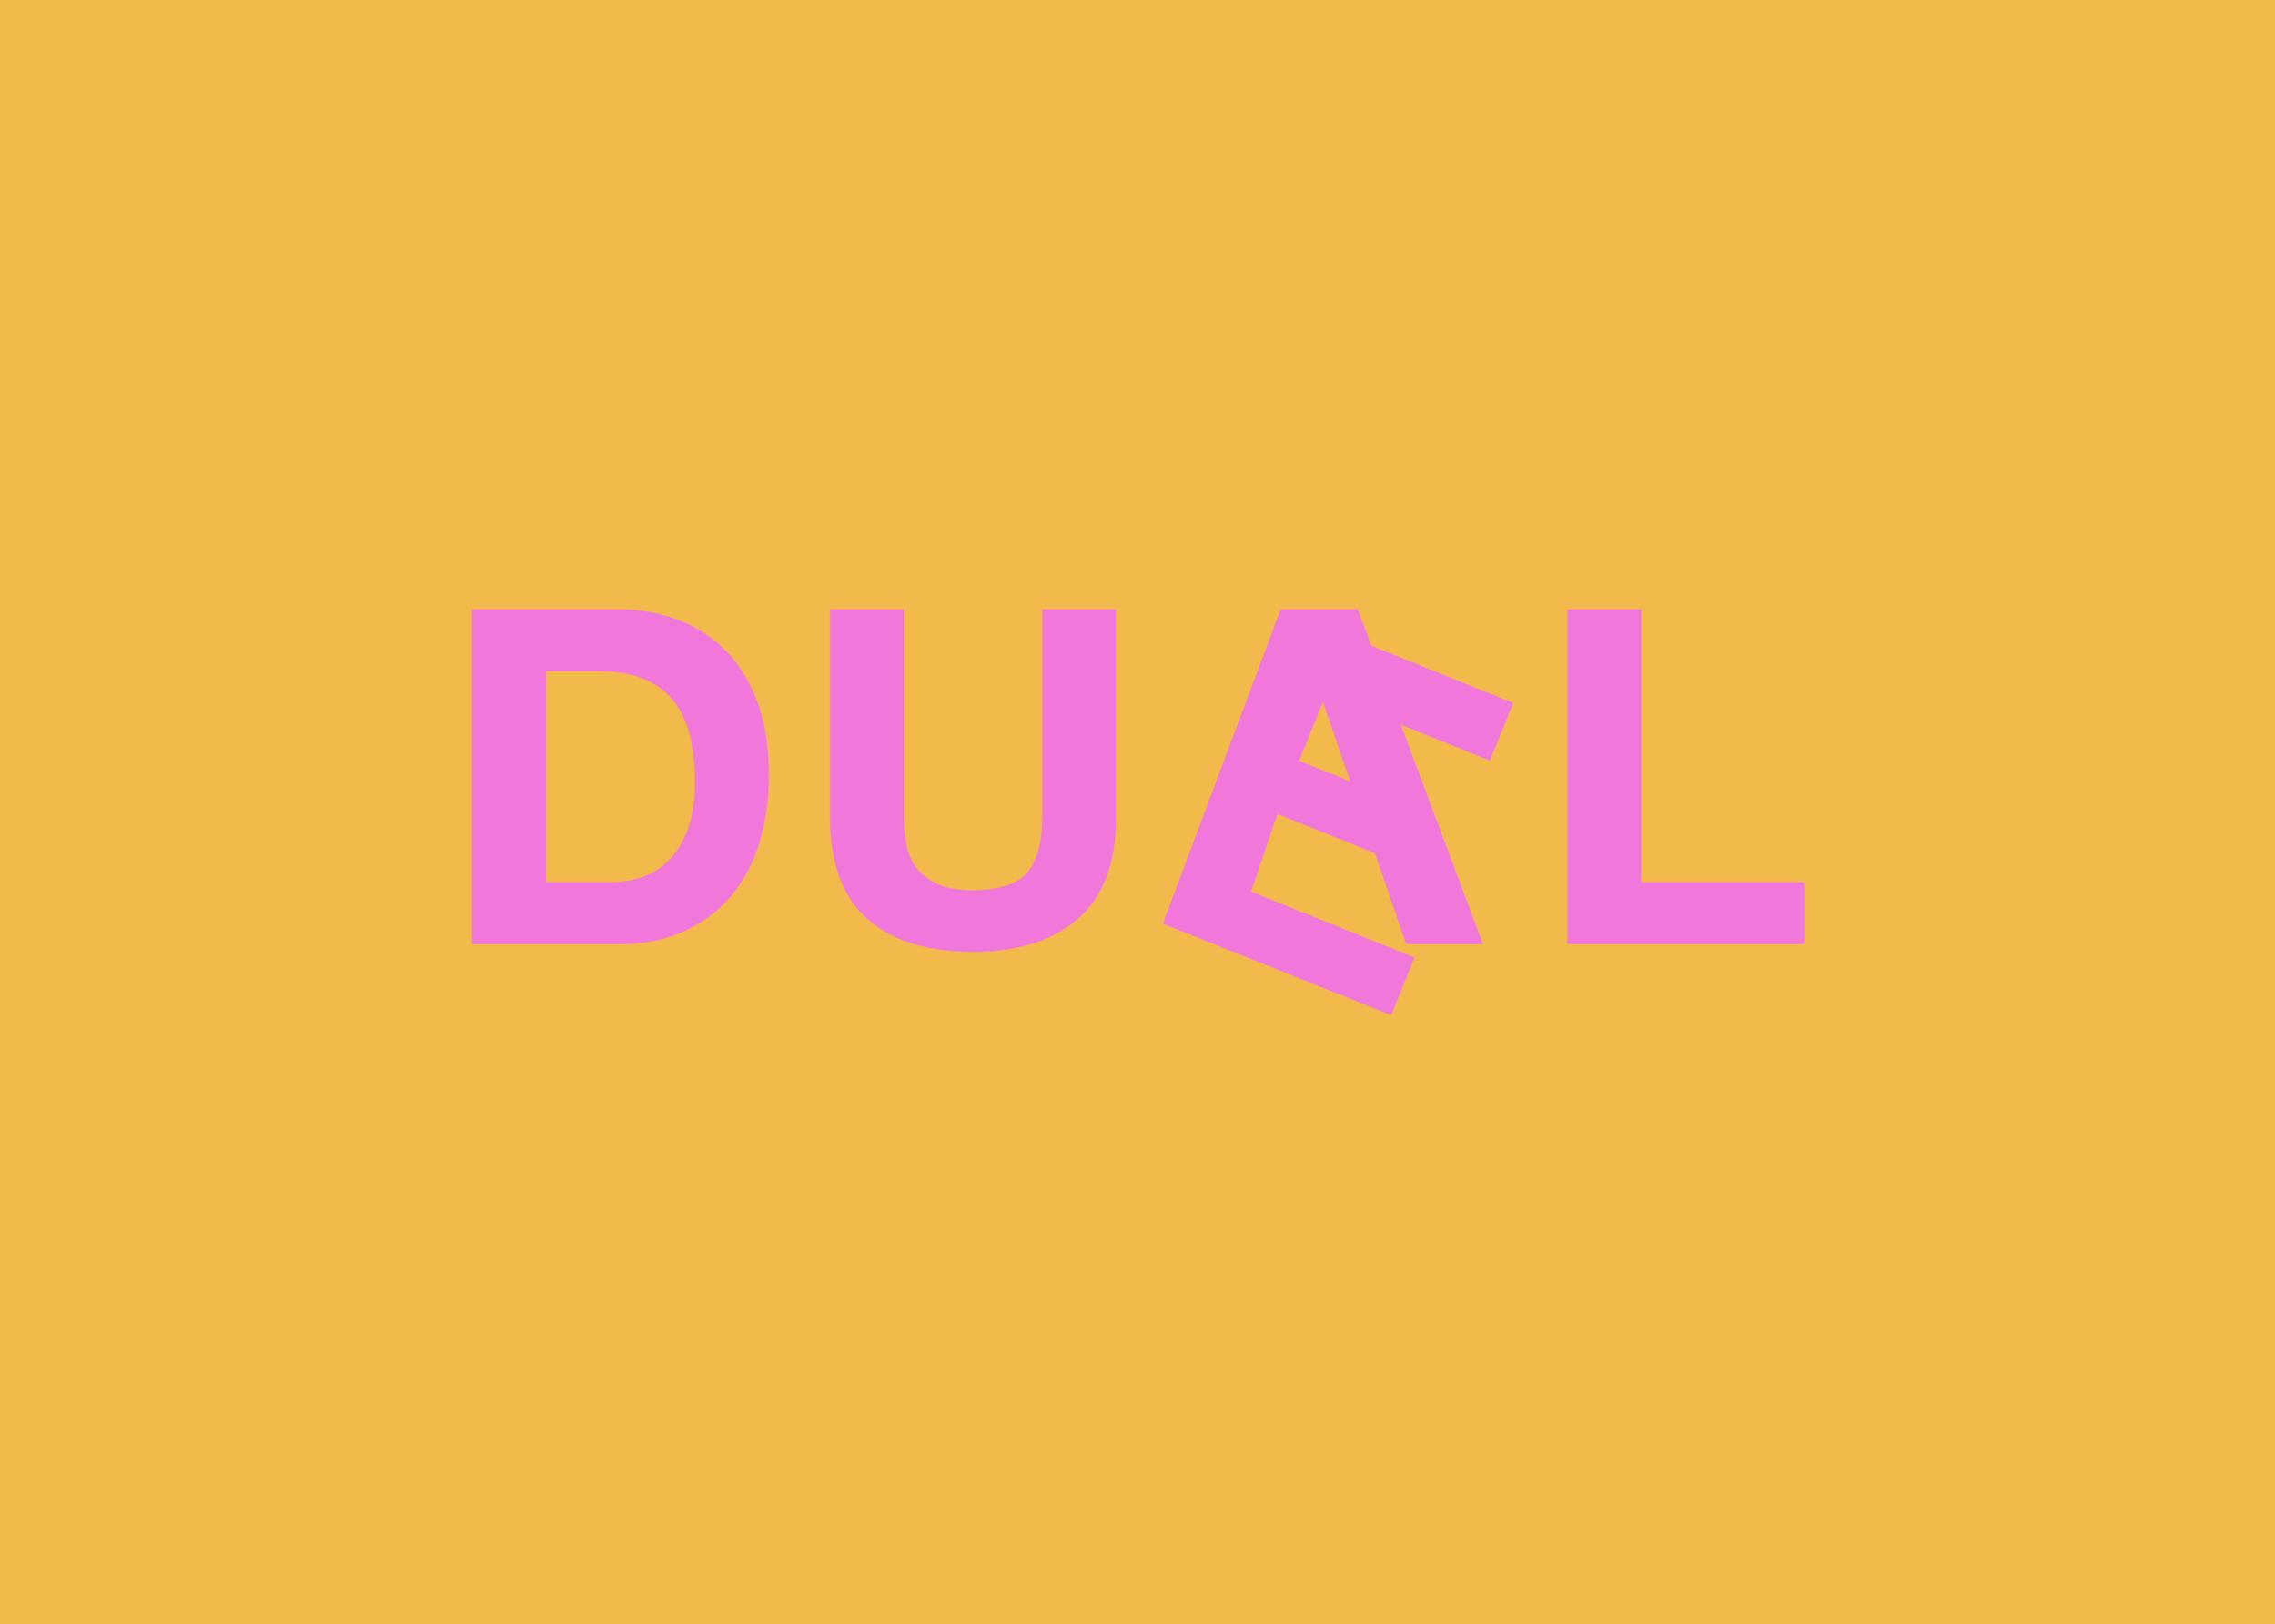 duael_flip16.png